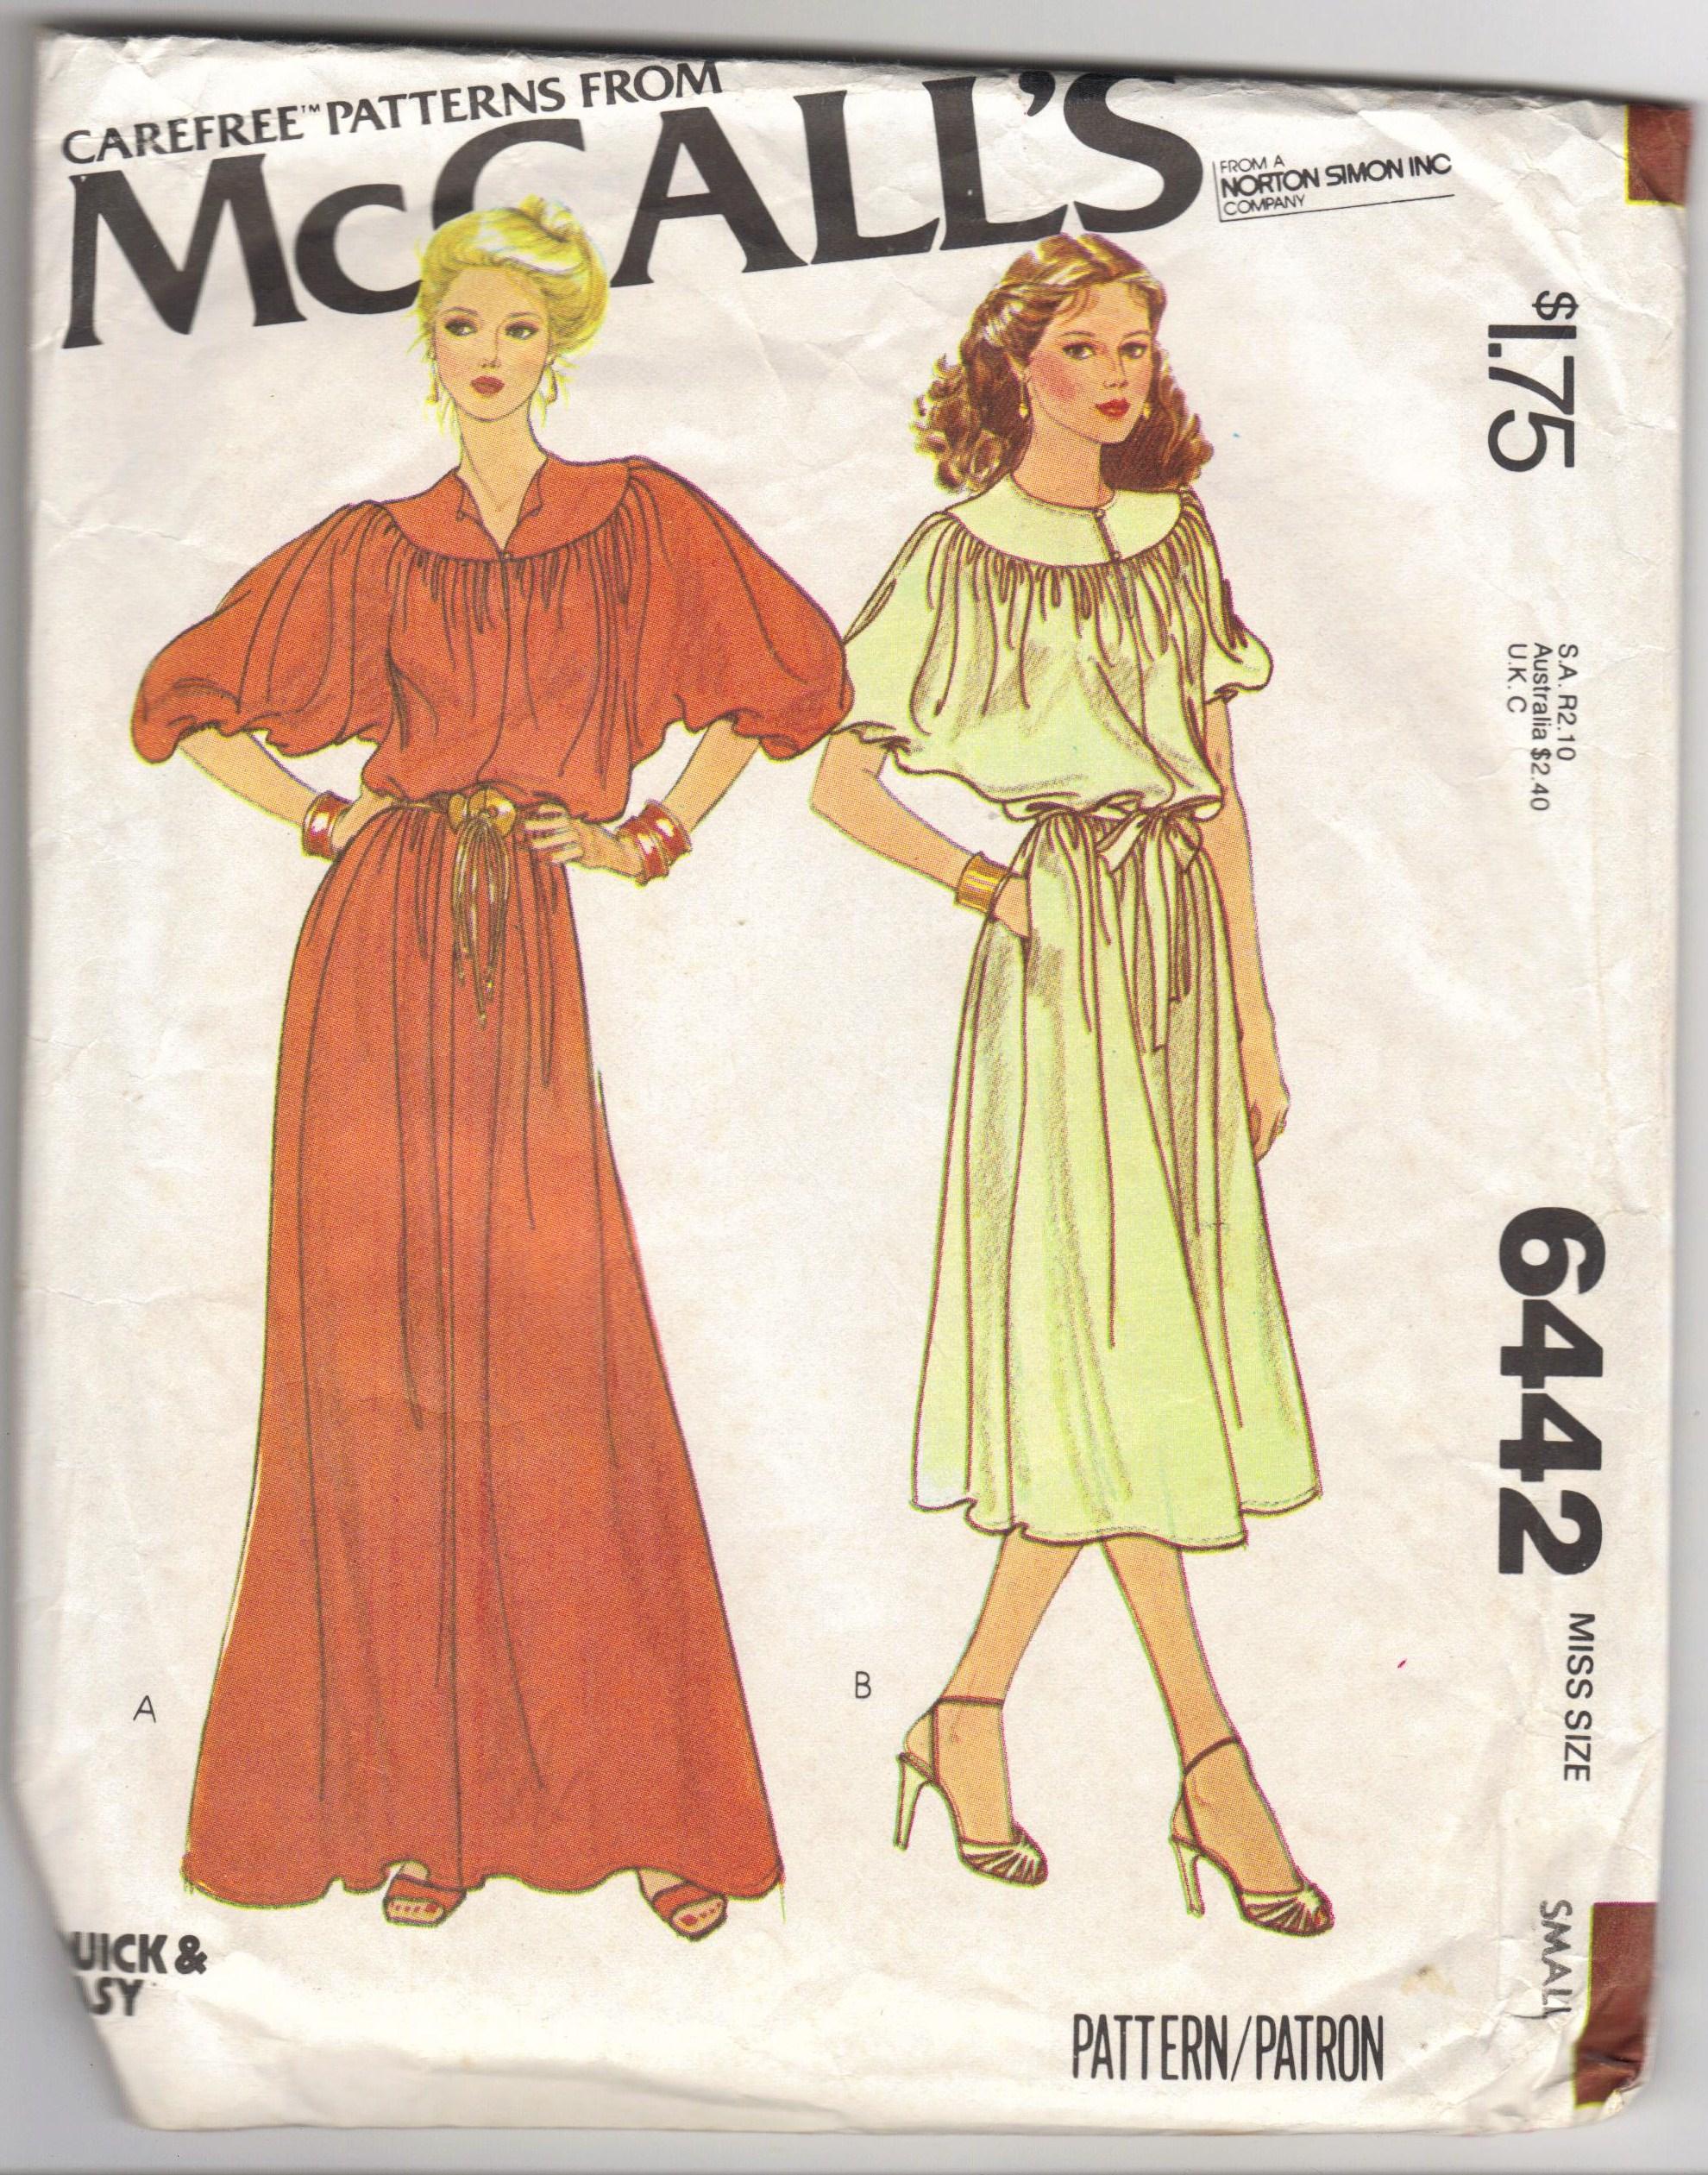 McCall's 6442